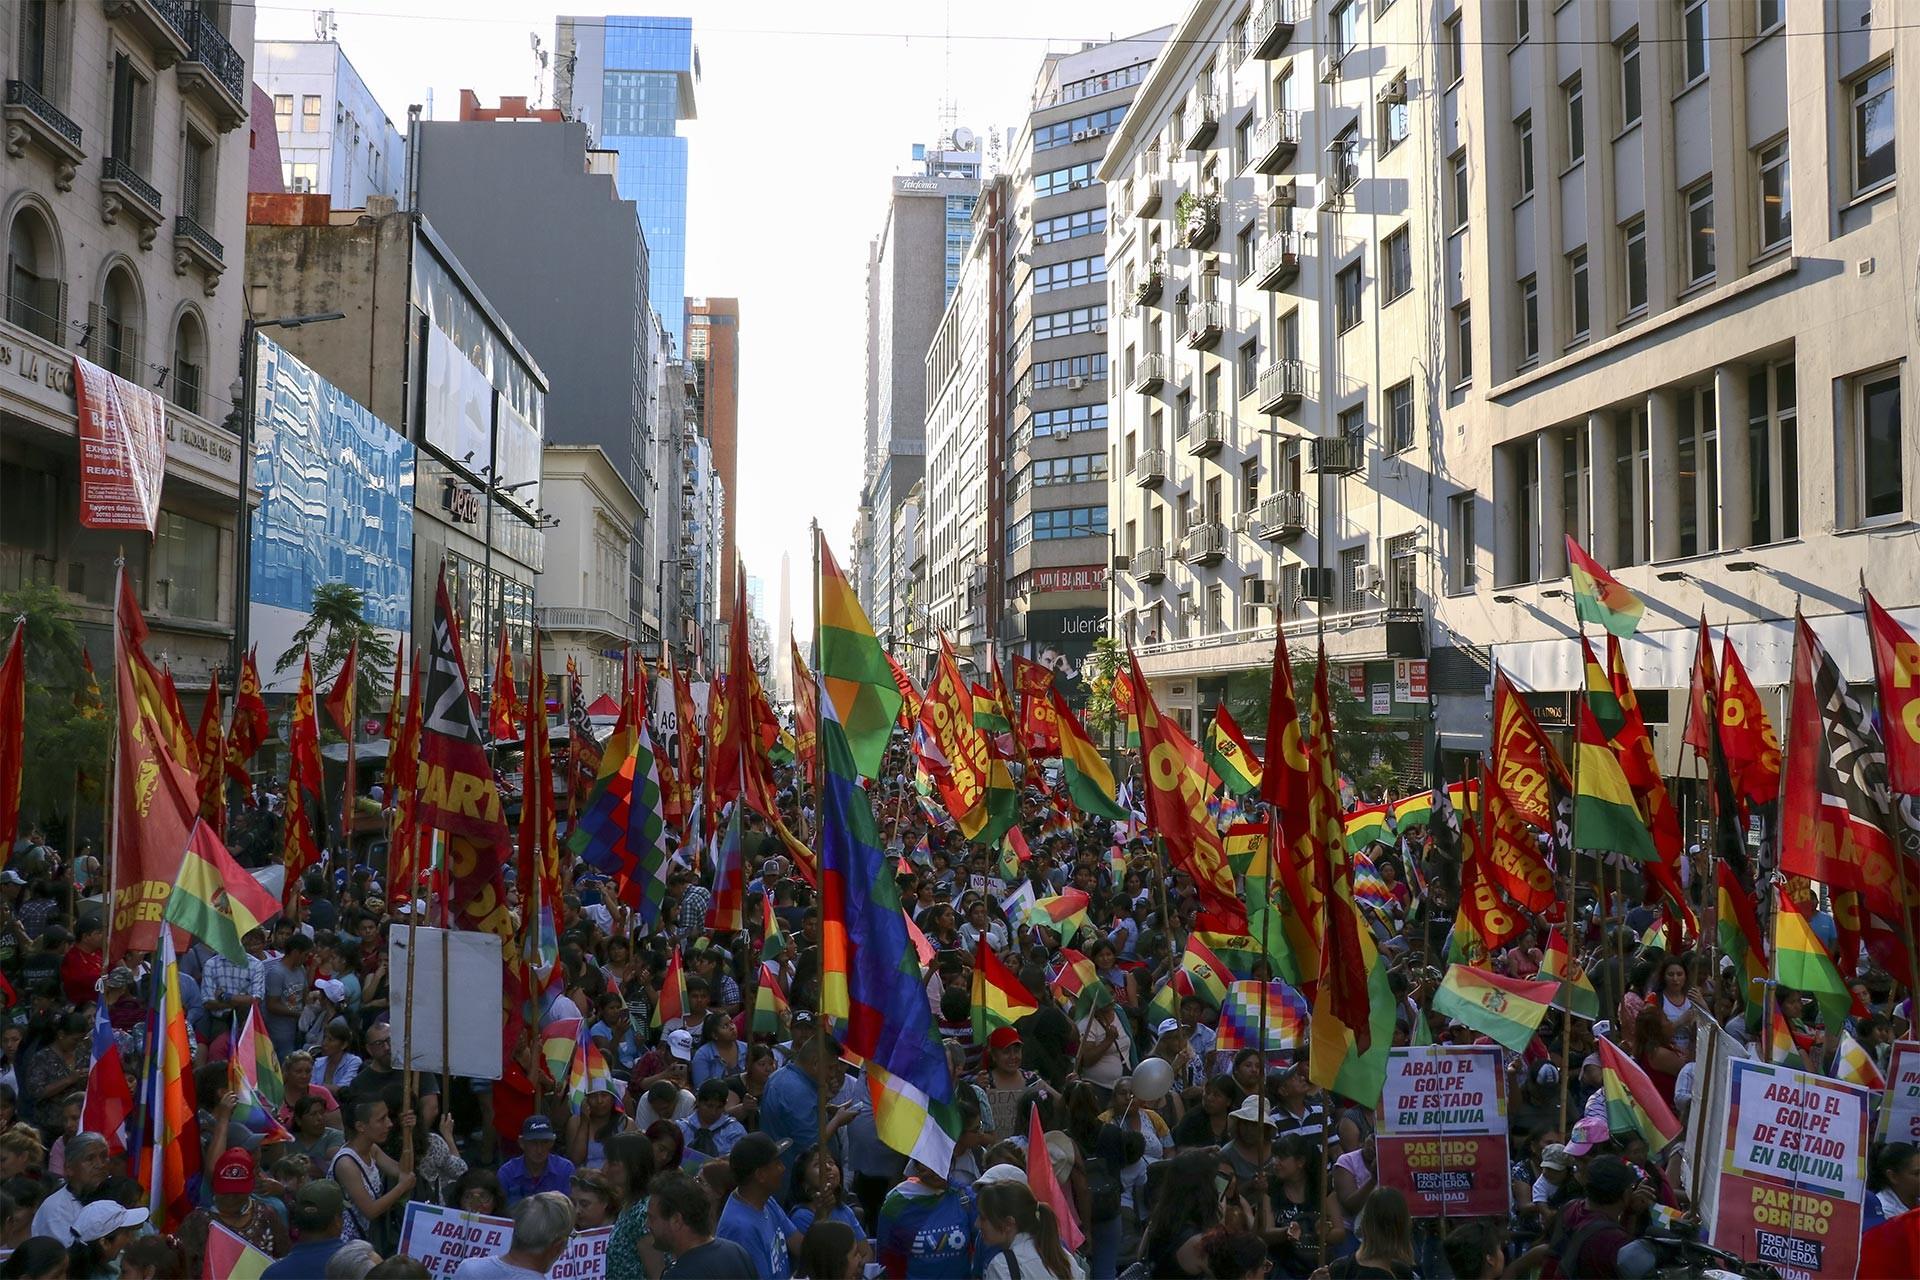 Arjantin'de Morales'e dönük darbeyi protesto eden kitle